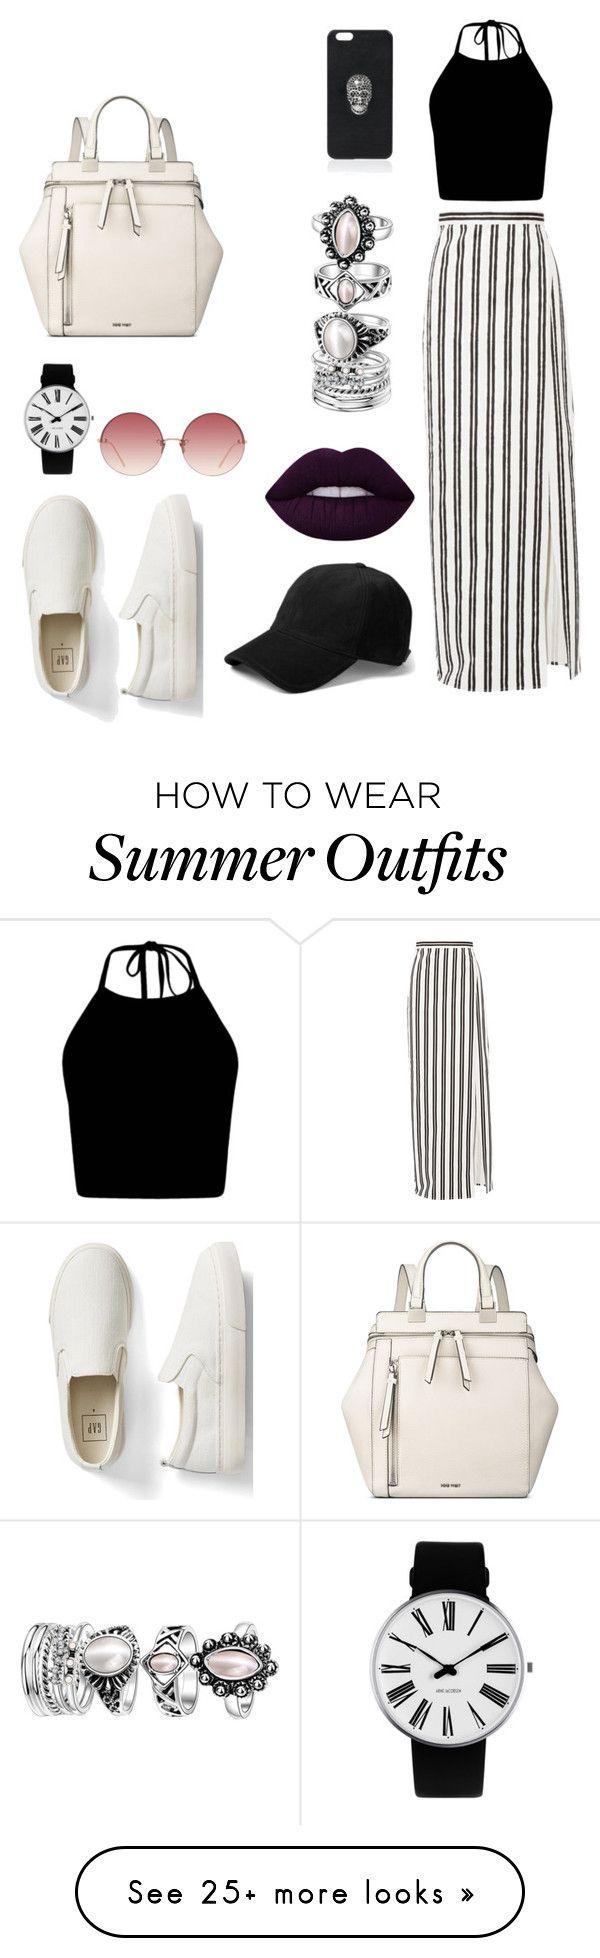 """summer outfit"" by elisaletizia on Polyvore featuring Balenciaga, Gap, Rosendahl, rag & bone, Linda Farrow, Nine West and Philipp Plein"